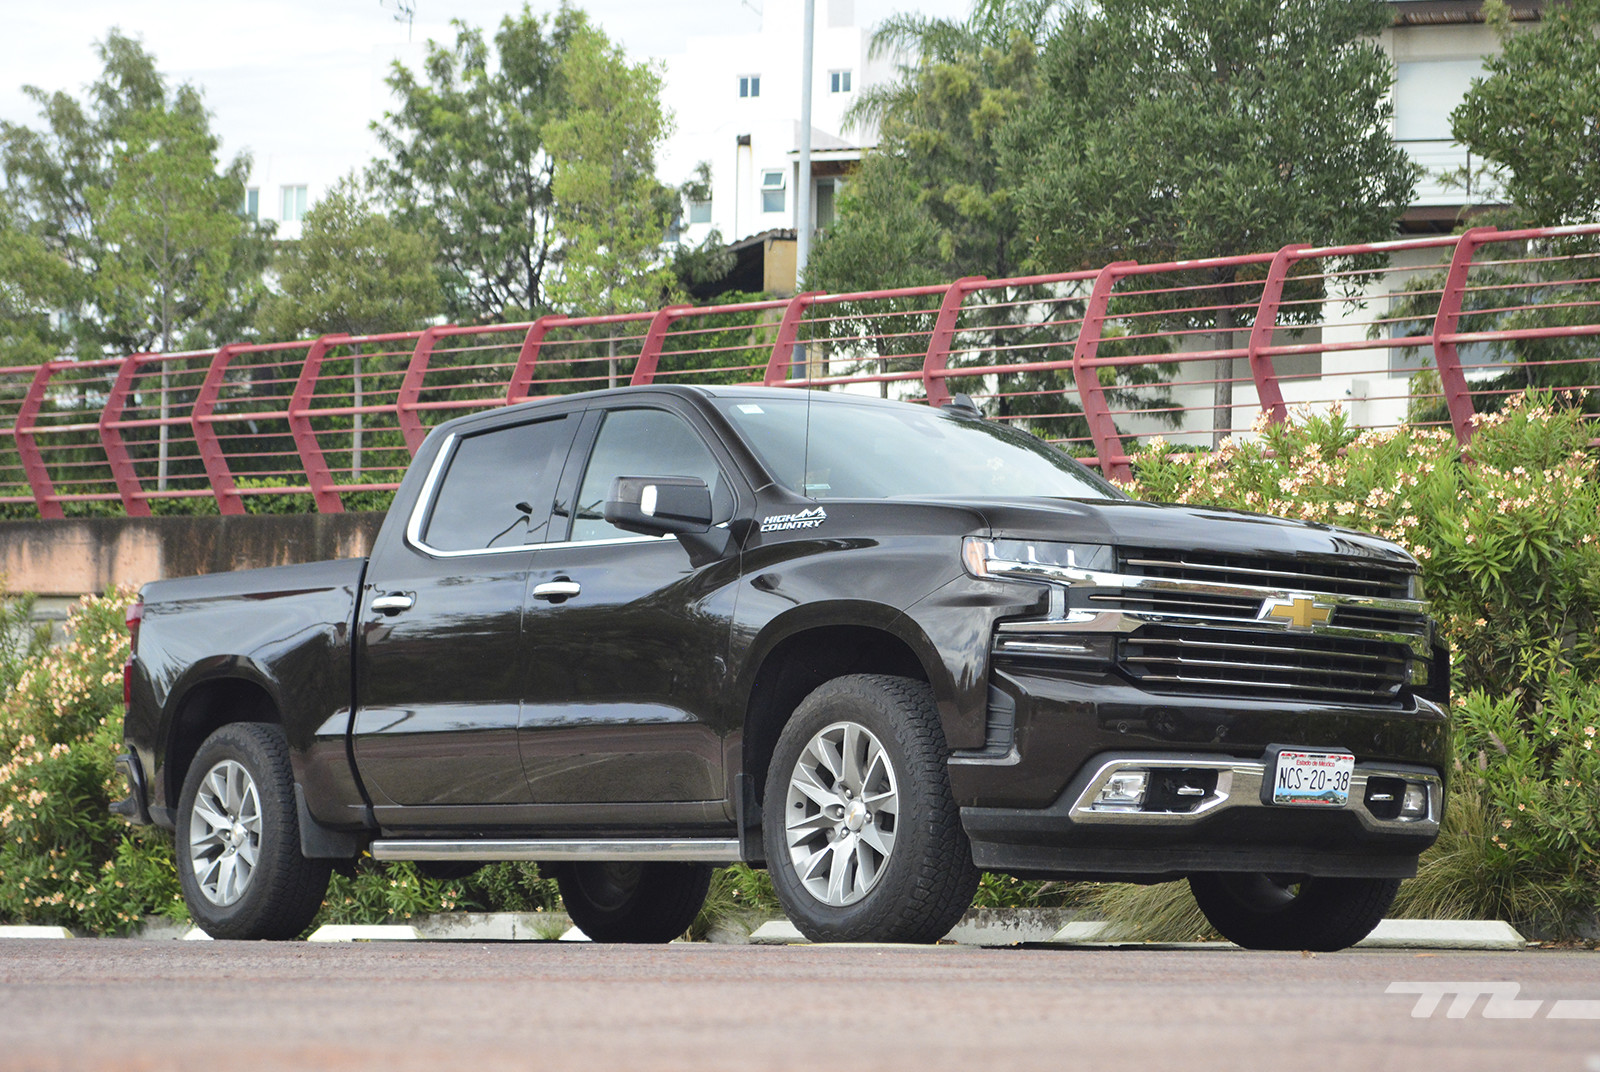 Foto de Chevrolet Cheyenne 2019 (prueba) (3/22)